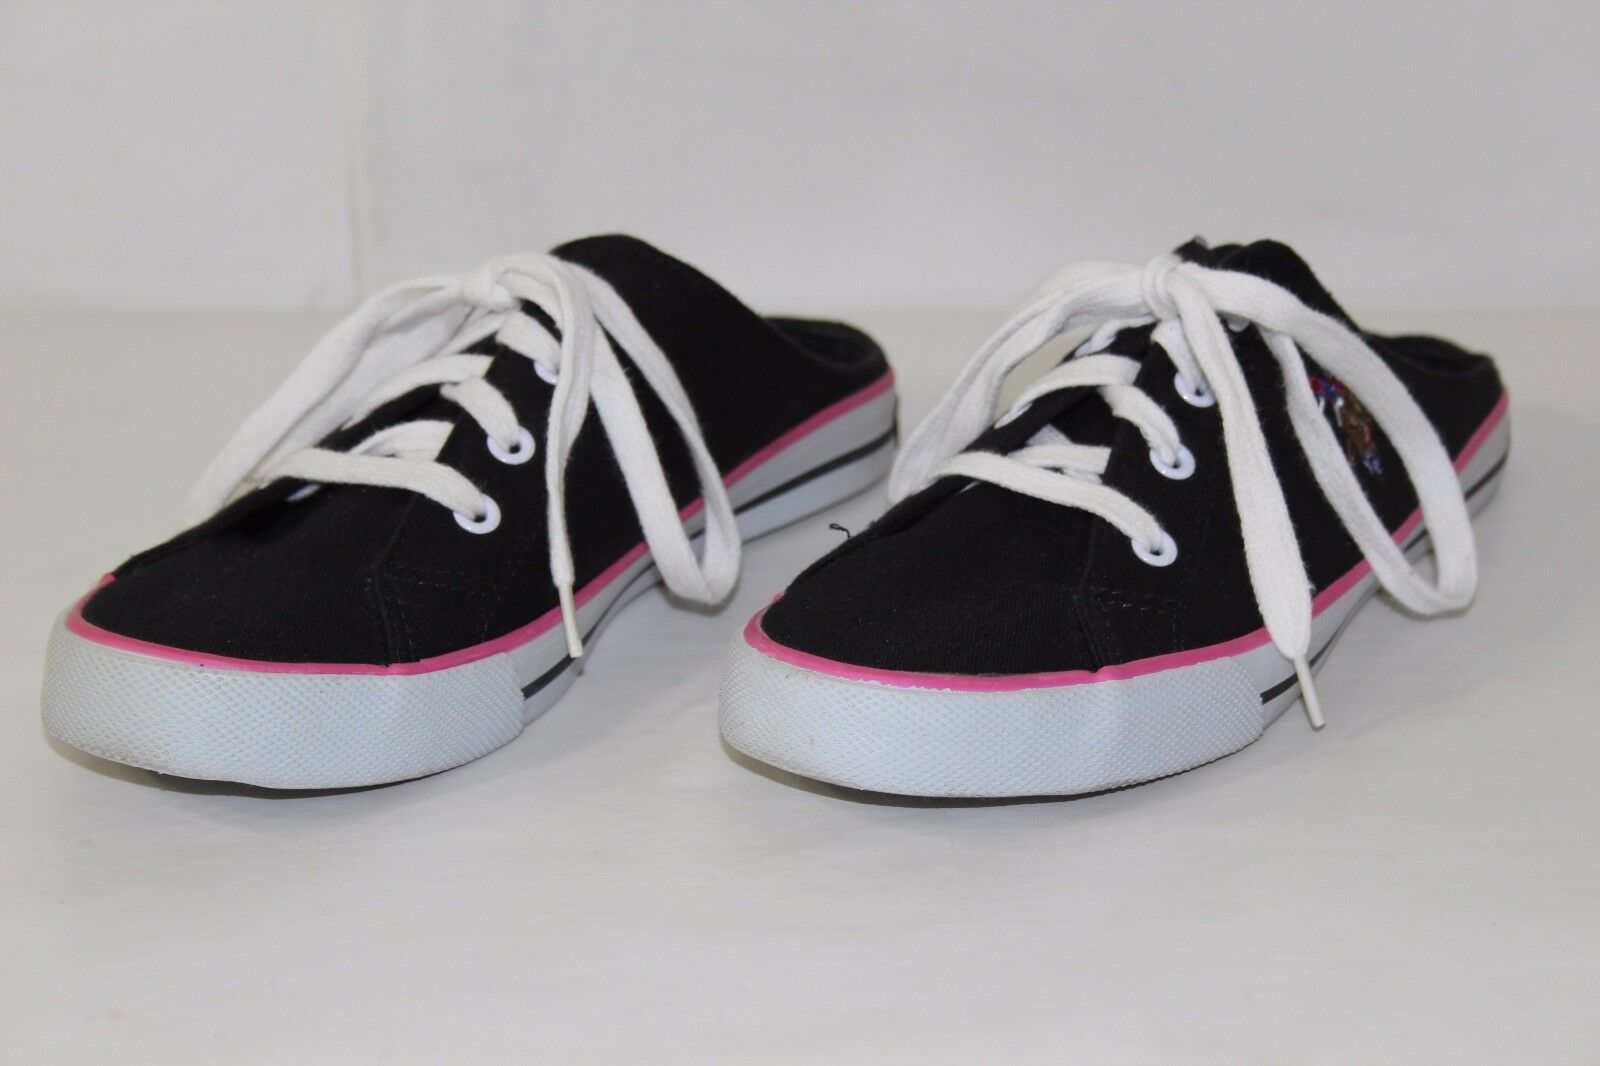 US 8 Polo Assn Womens Sz 8 US M Black White Pink Canvas Laces Low Heel Athletic Shoes b7d634